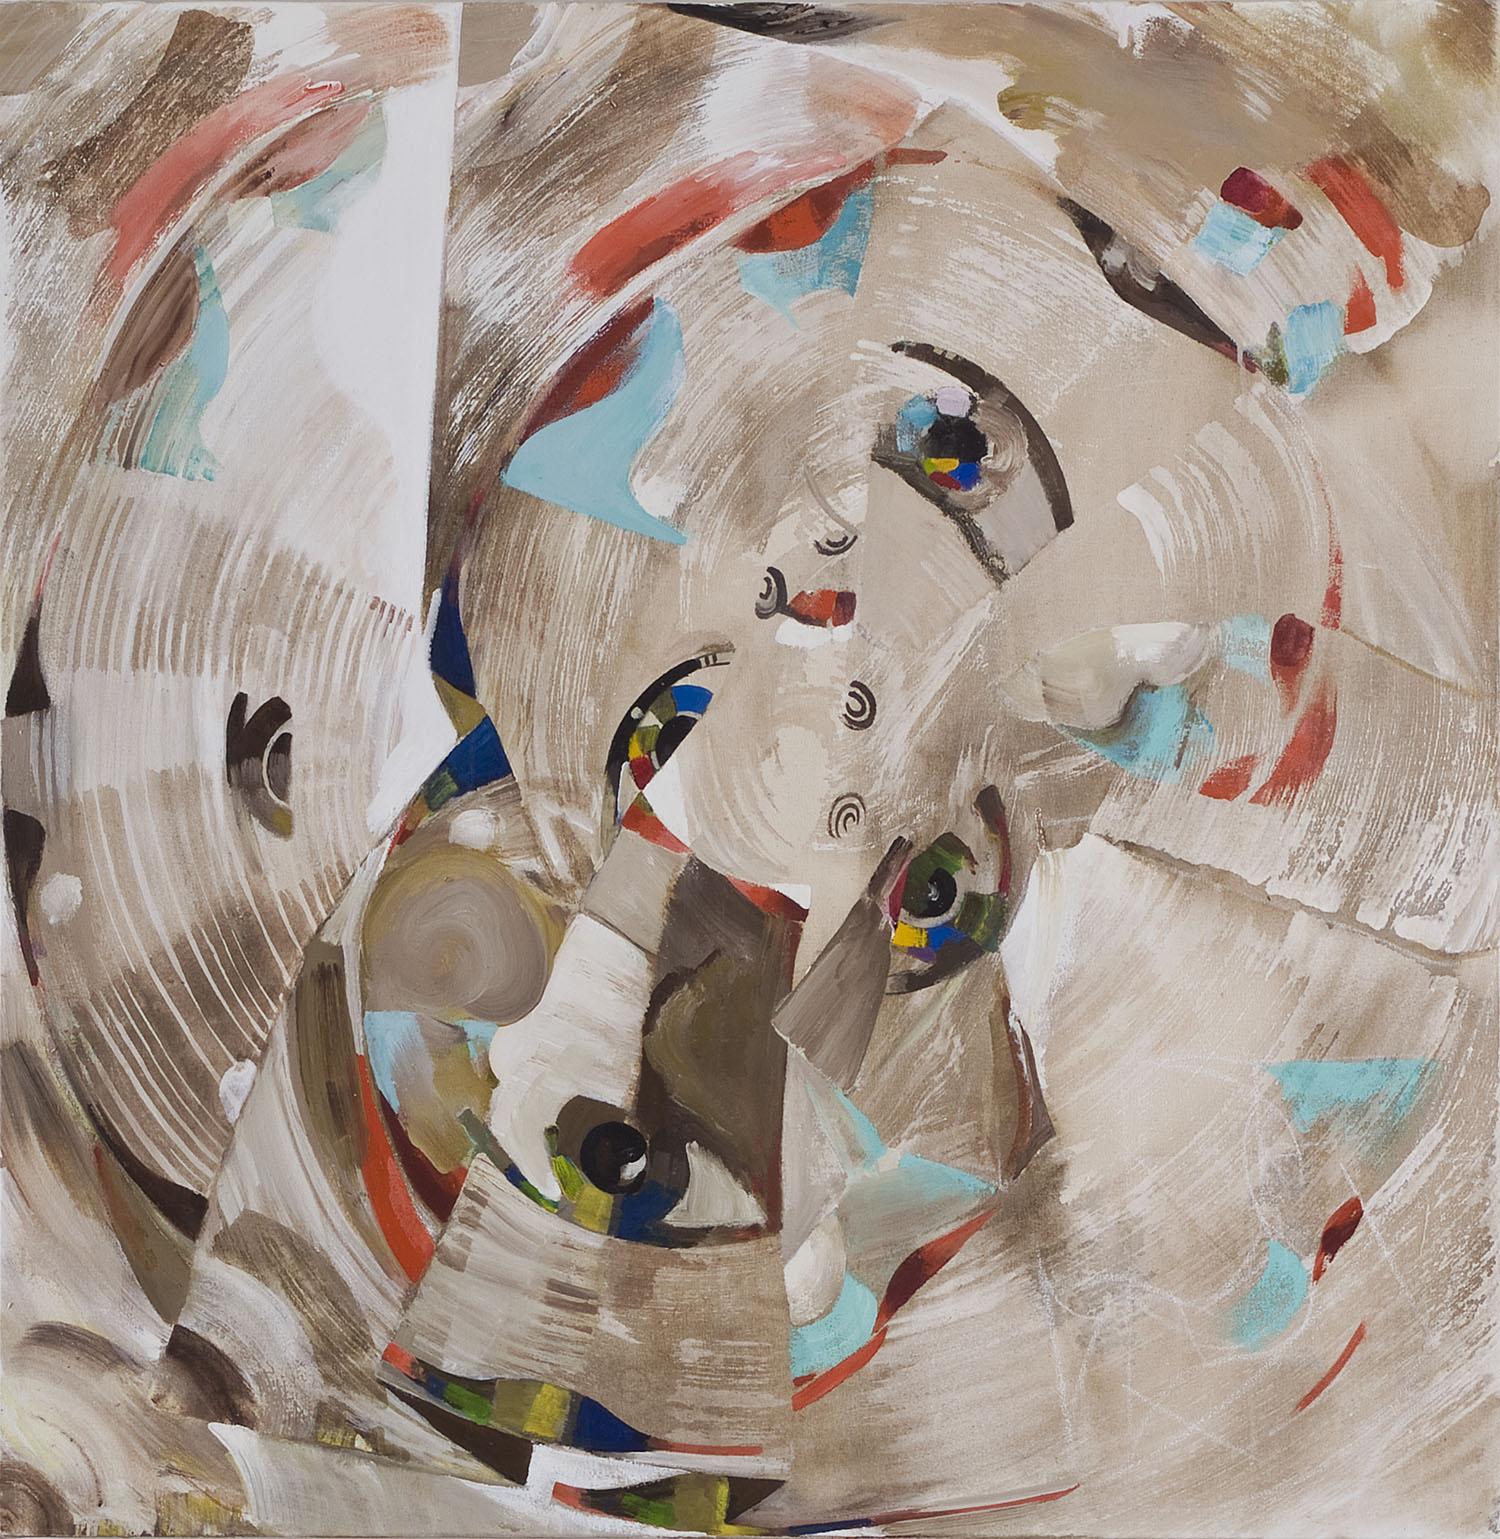 o.T. | Acryl auf Leinwand | 101 x 101 cm